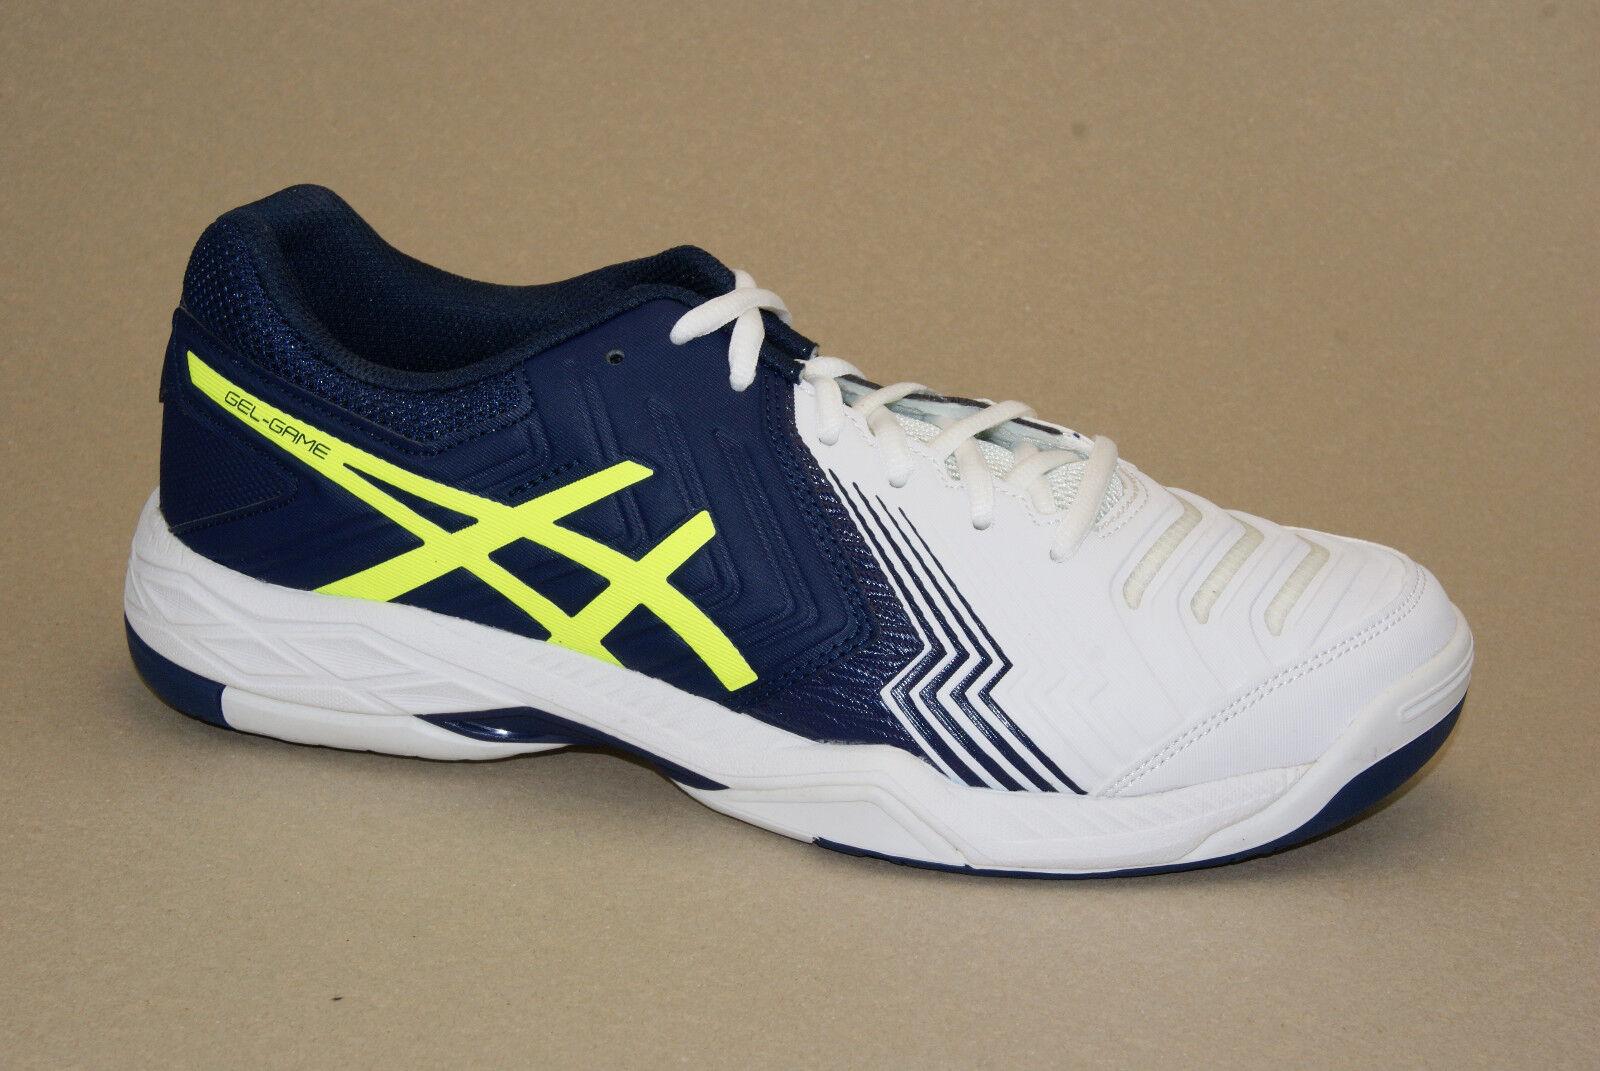 Asics Gel-Game 6 Tennis shoes Trainers Sport shoes Men's shoes E705y-0149